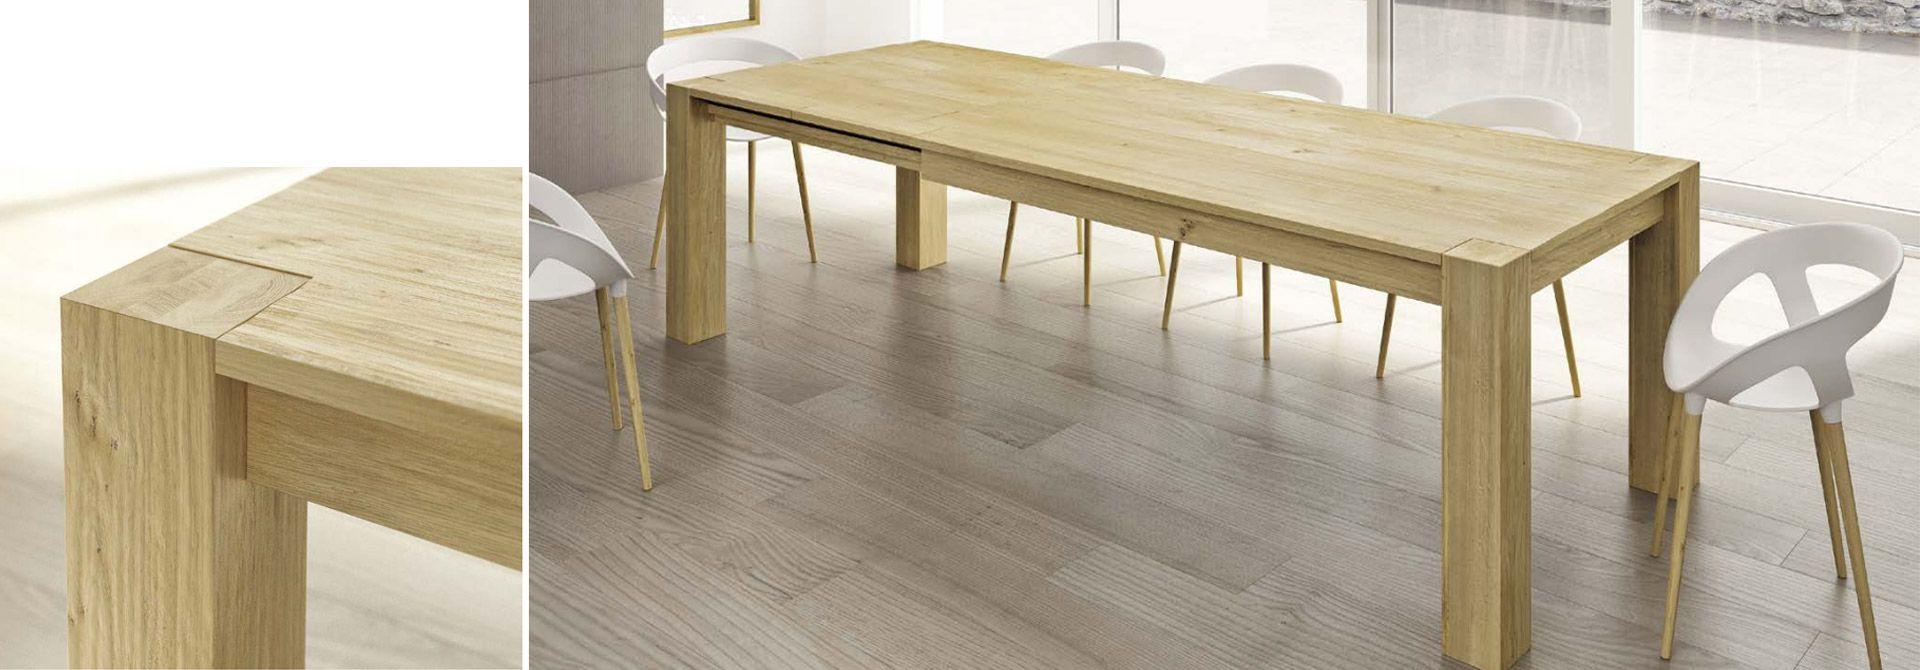 Duedi tavoli e sedie vendita e produzione tavoli sedie - Vendita tavoli e sedie ...